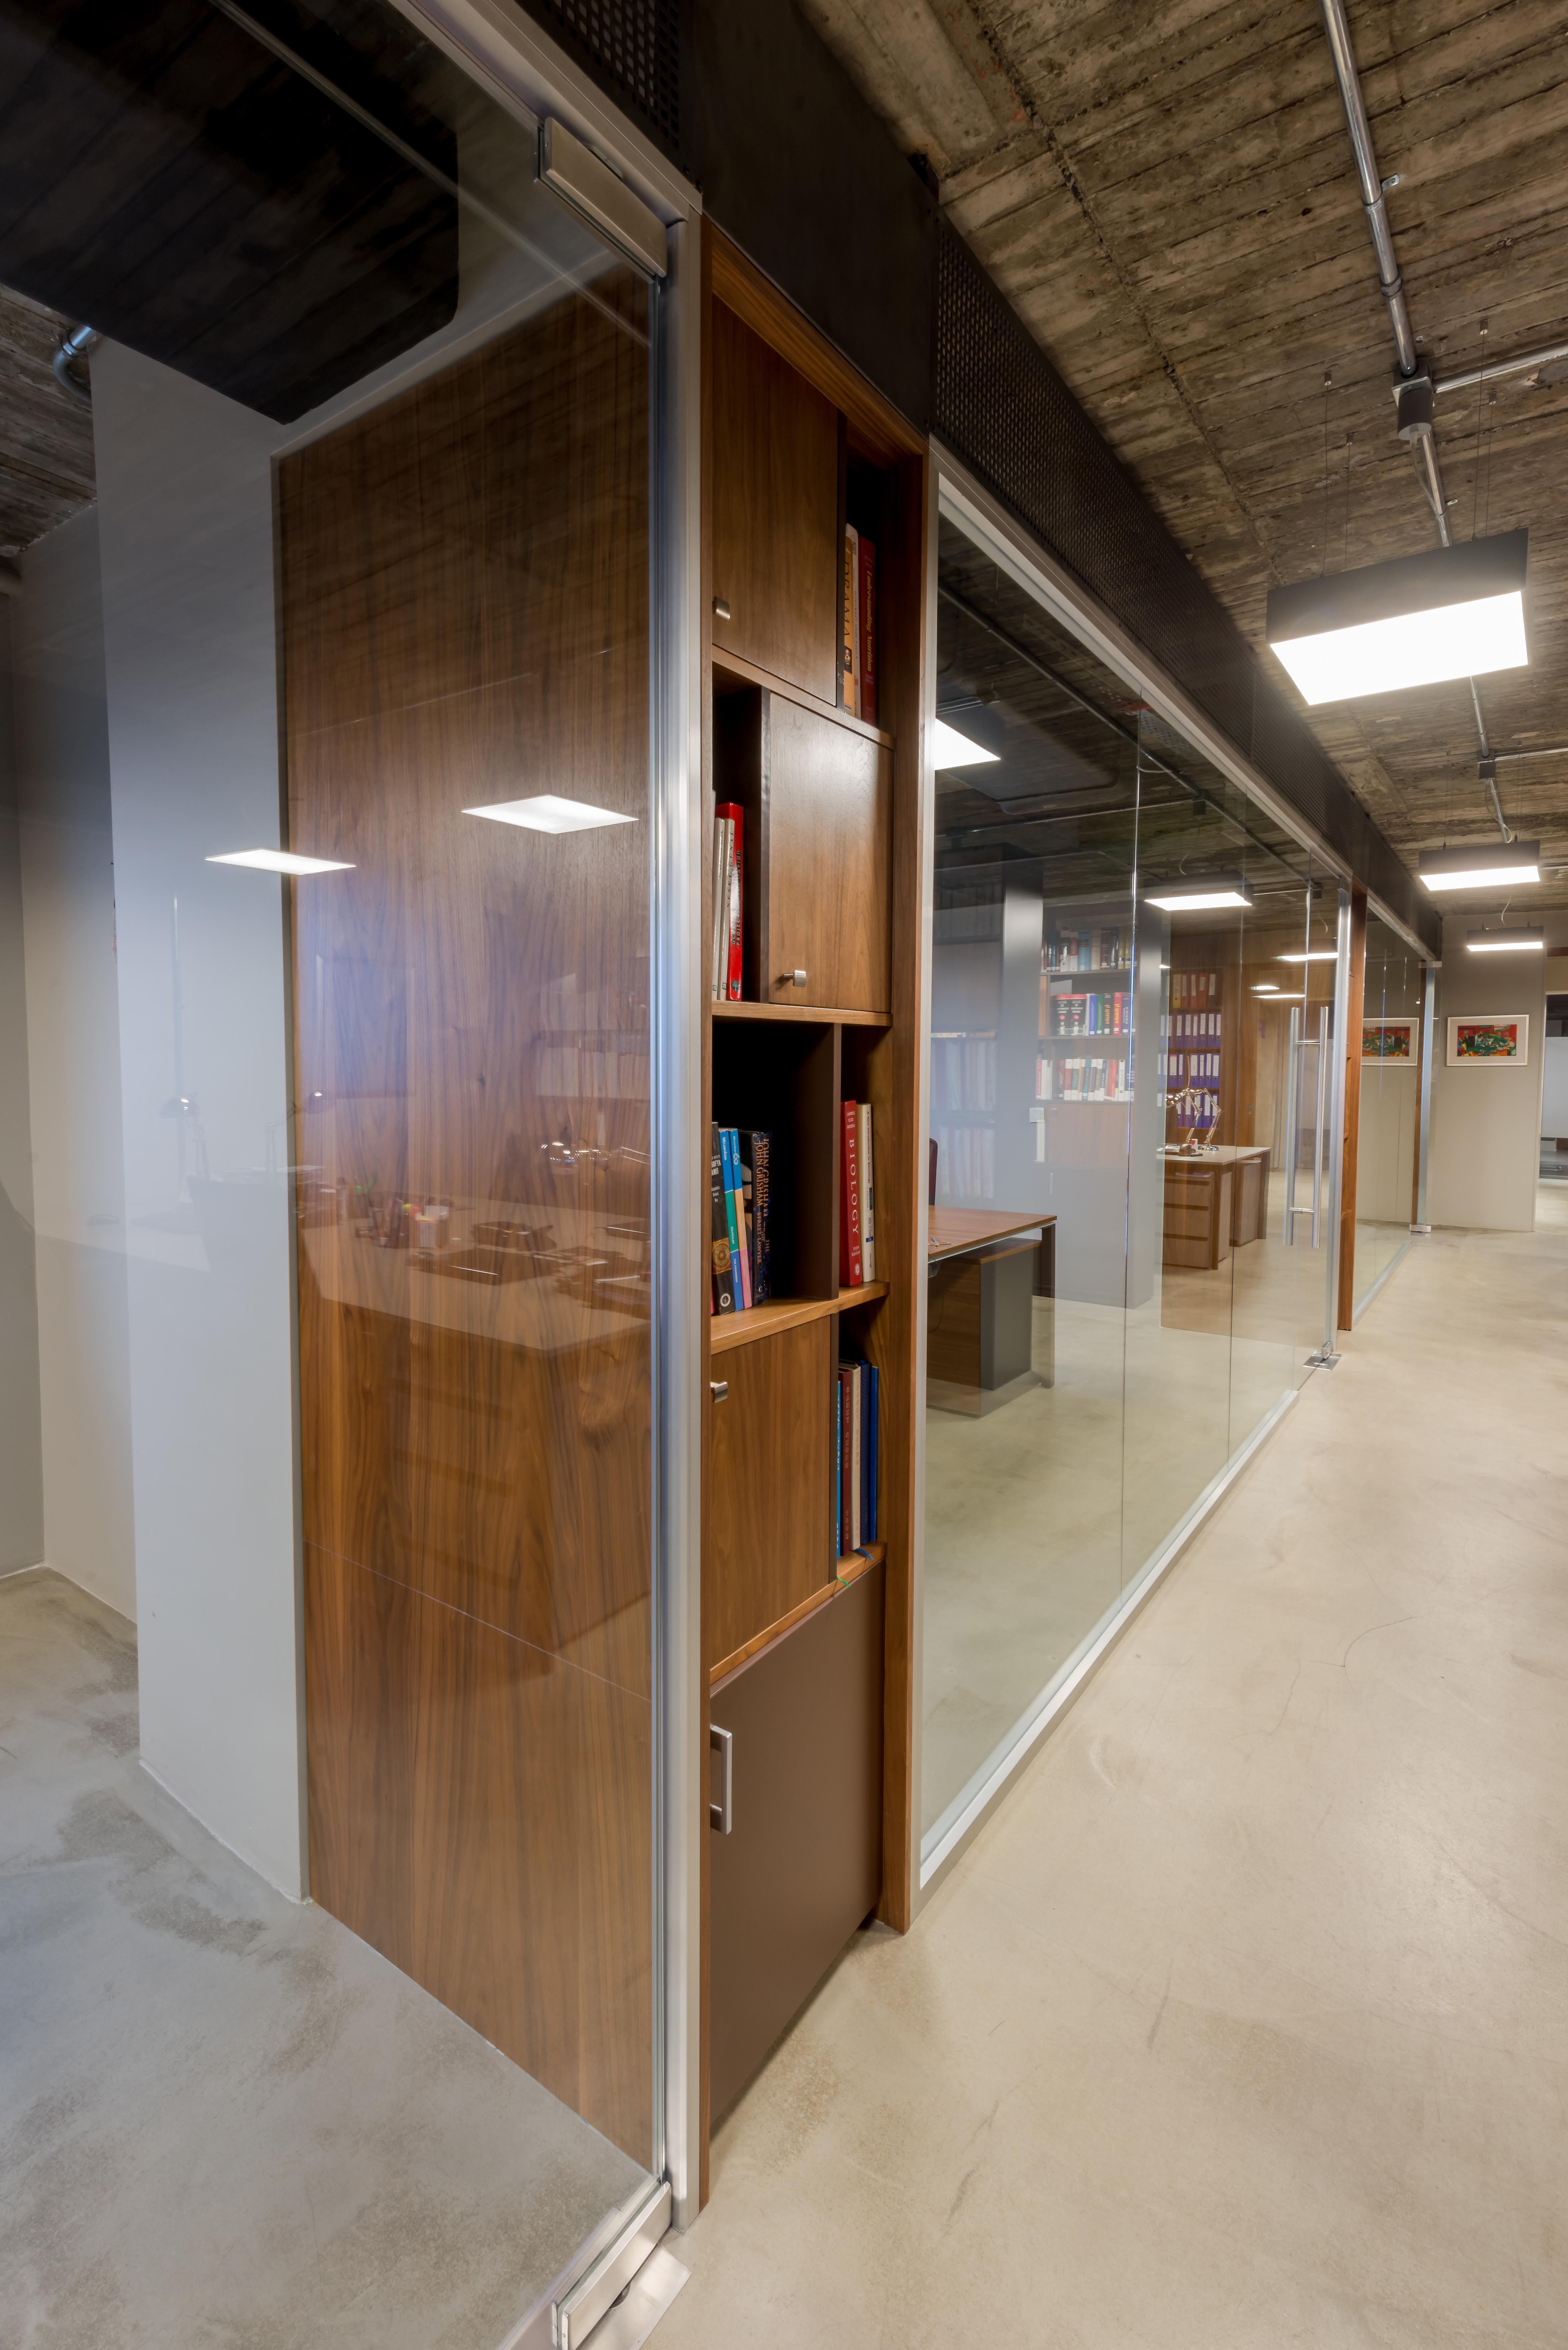 Dila+Gokalp+Architects+-+PAE+Law+Office+-+Calisma+36